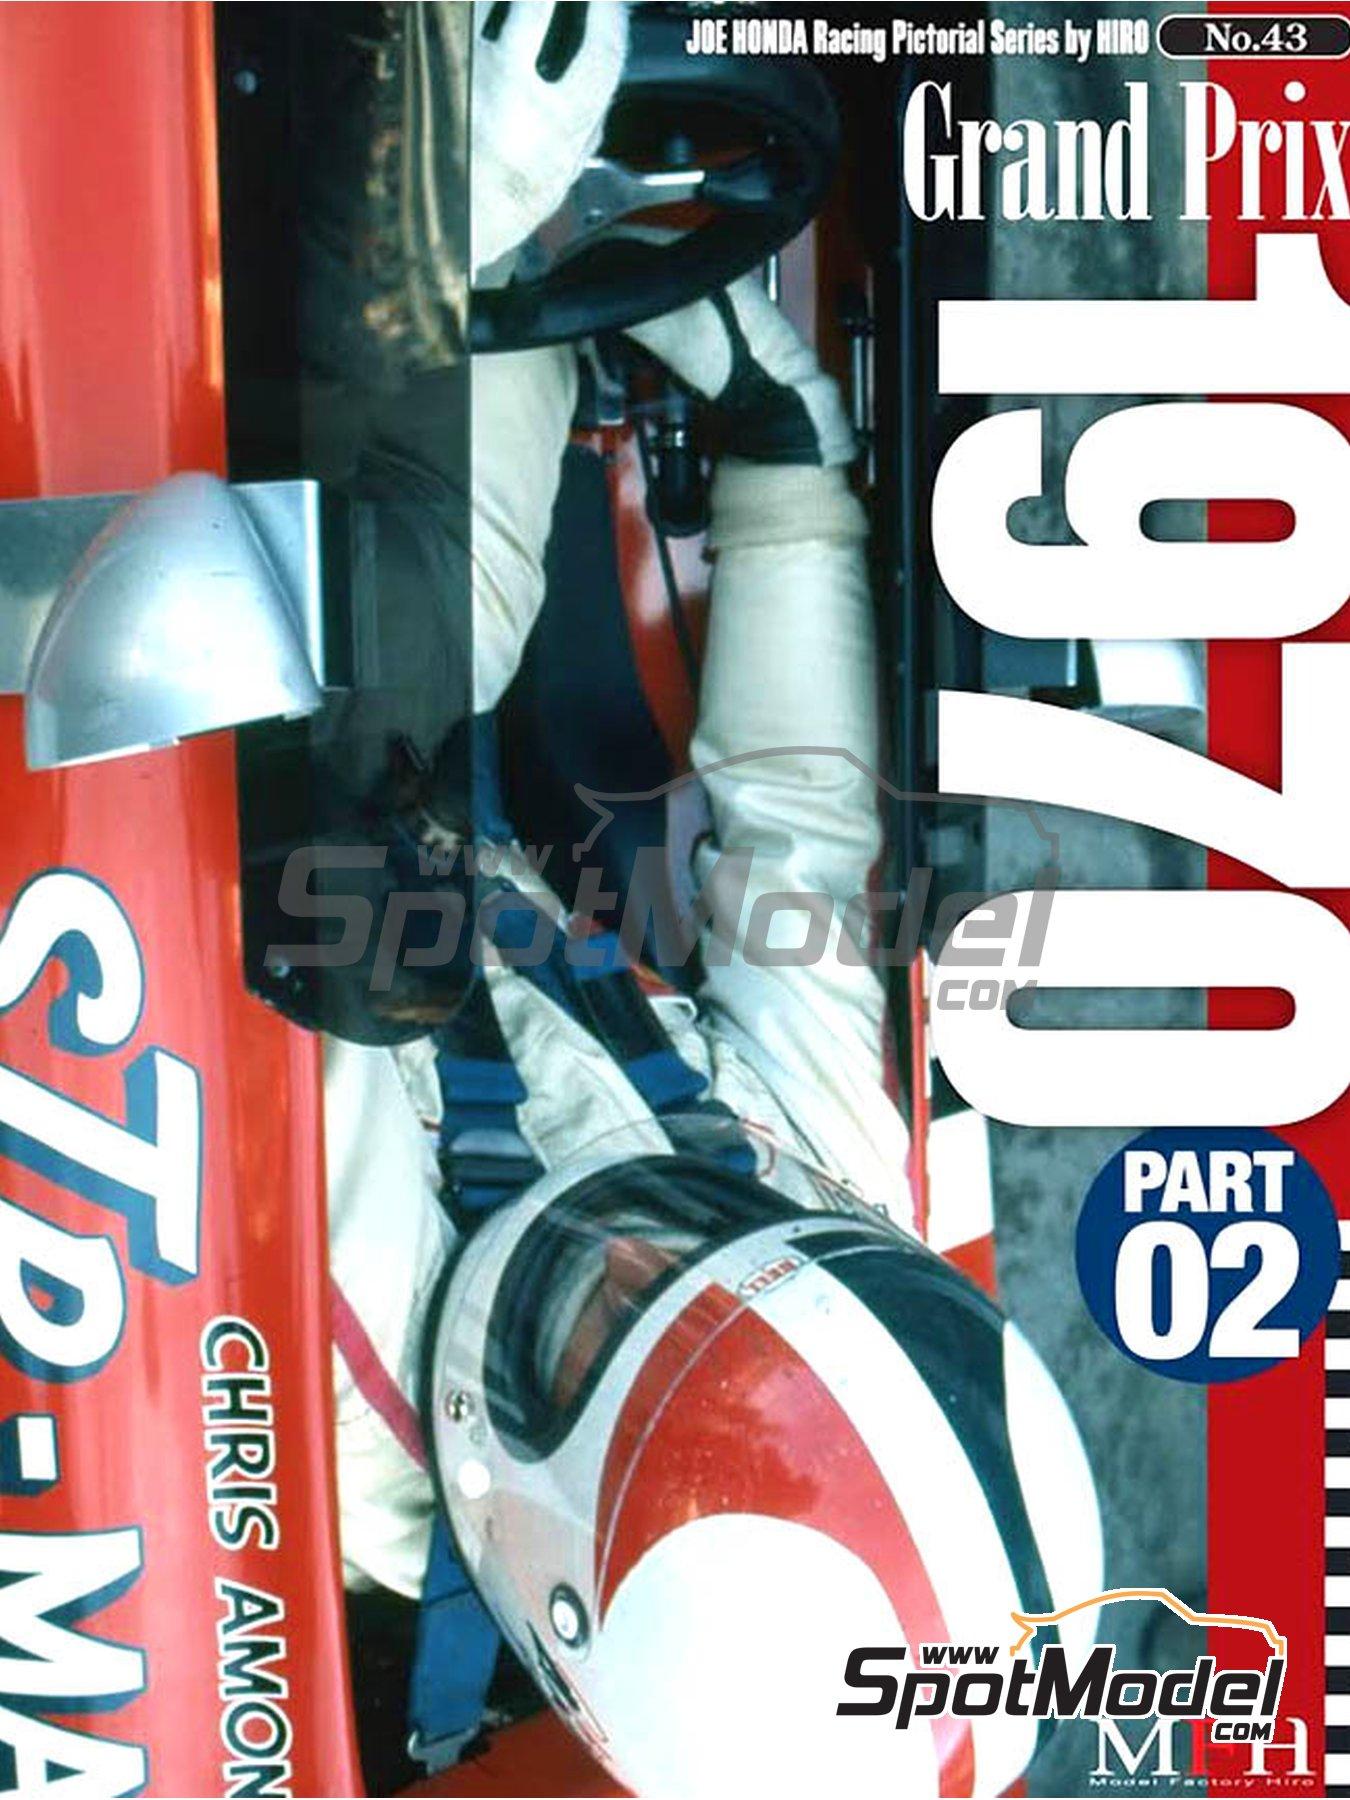 Joe Honda Racing Pictorial Series: Grand Prix, part 2 -  1970 | Reference / walkaround book manufactured by Model Factory Hiro (ref.MFH-JH43) image